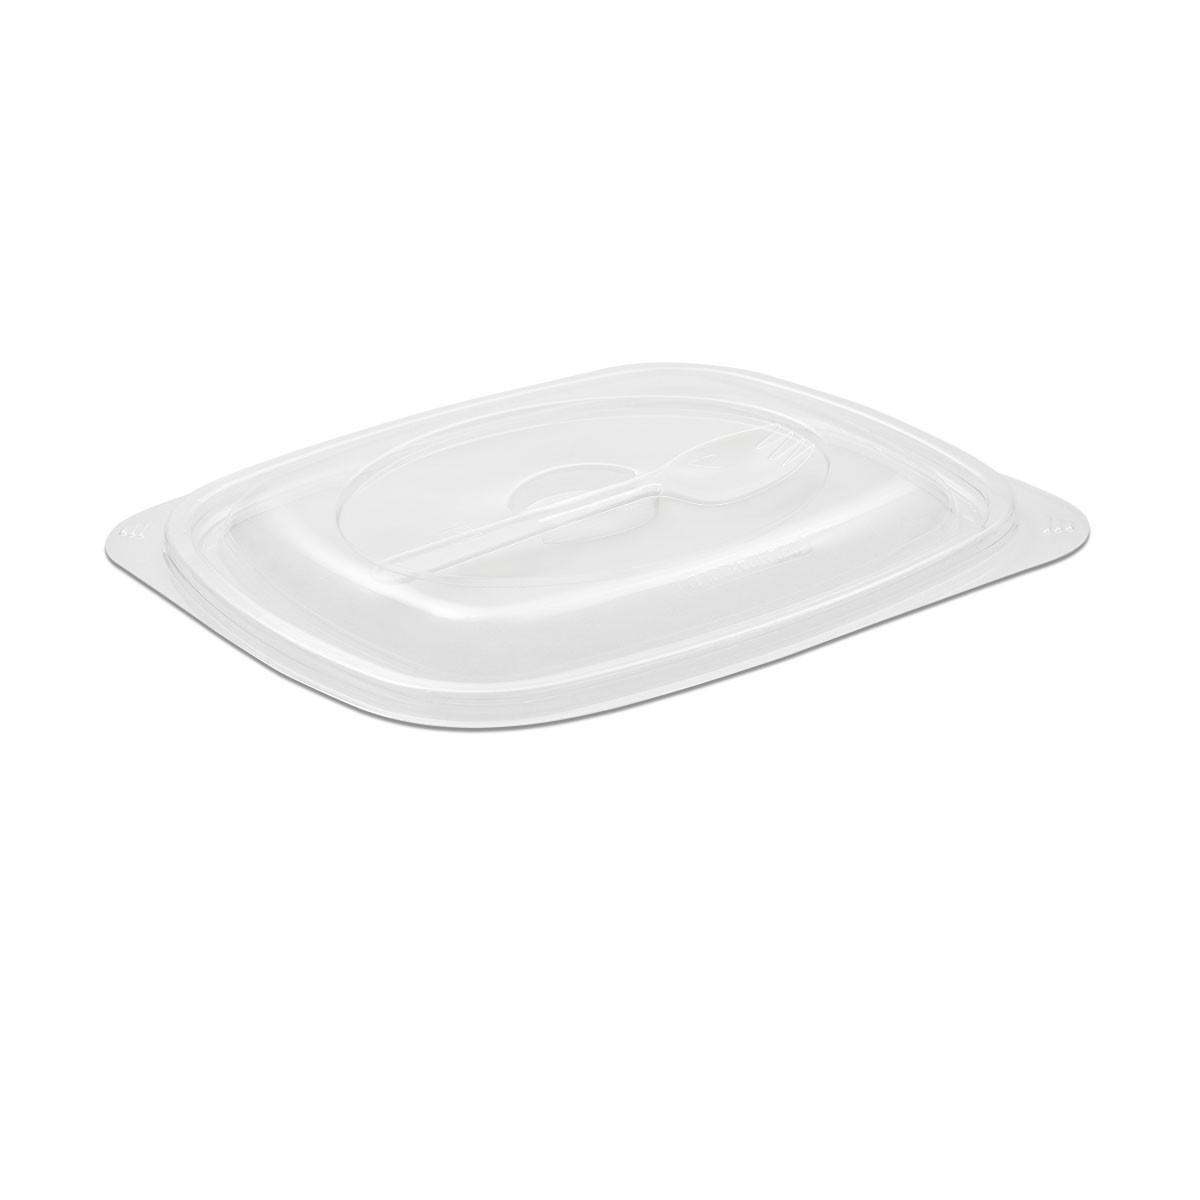 Tutipac Dome Lid w/ Spork for 24/32oz Plain Hot Multipurpose Containers PP   150pcs